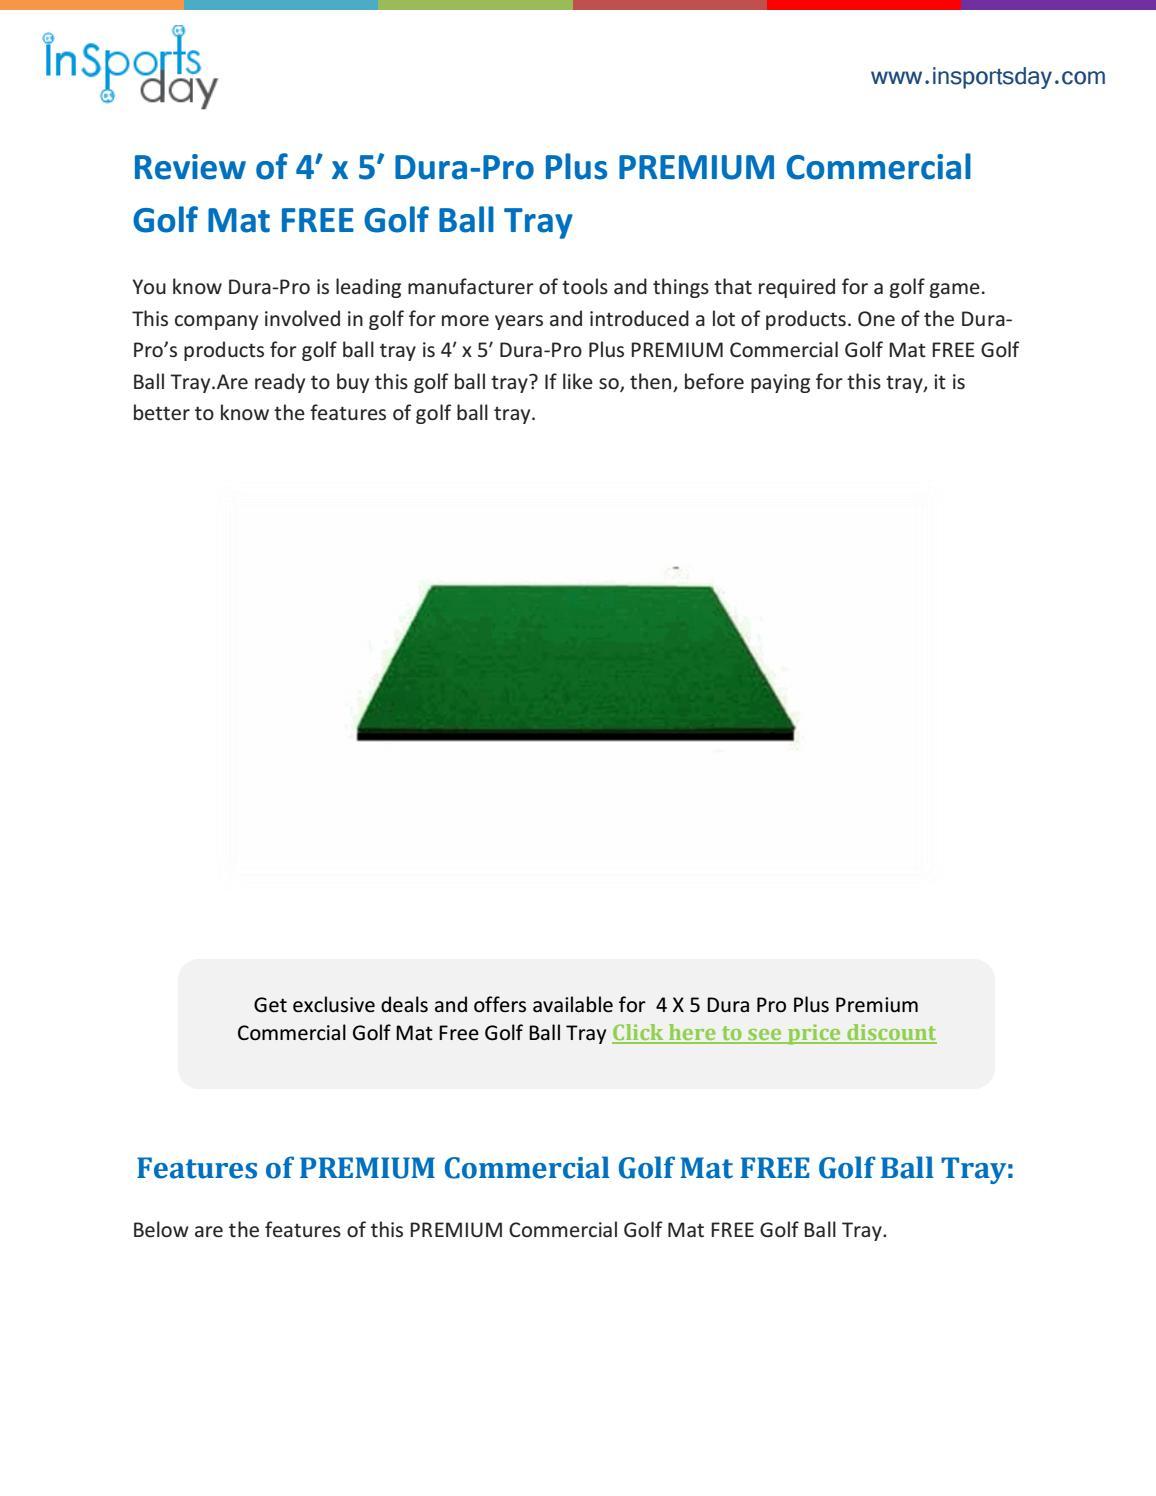 forbidden com practice rough road golf holes mat dp indoor with tee mats residential pad backyard x grass durapro amazon hitting